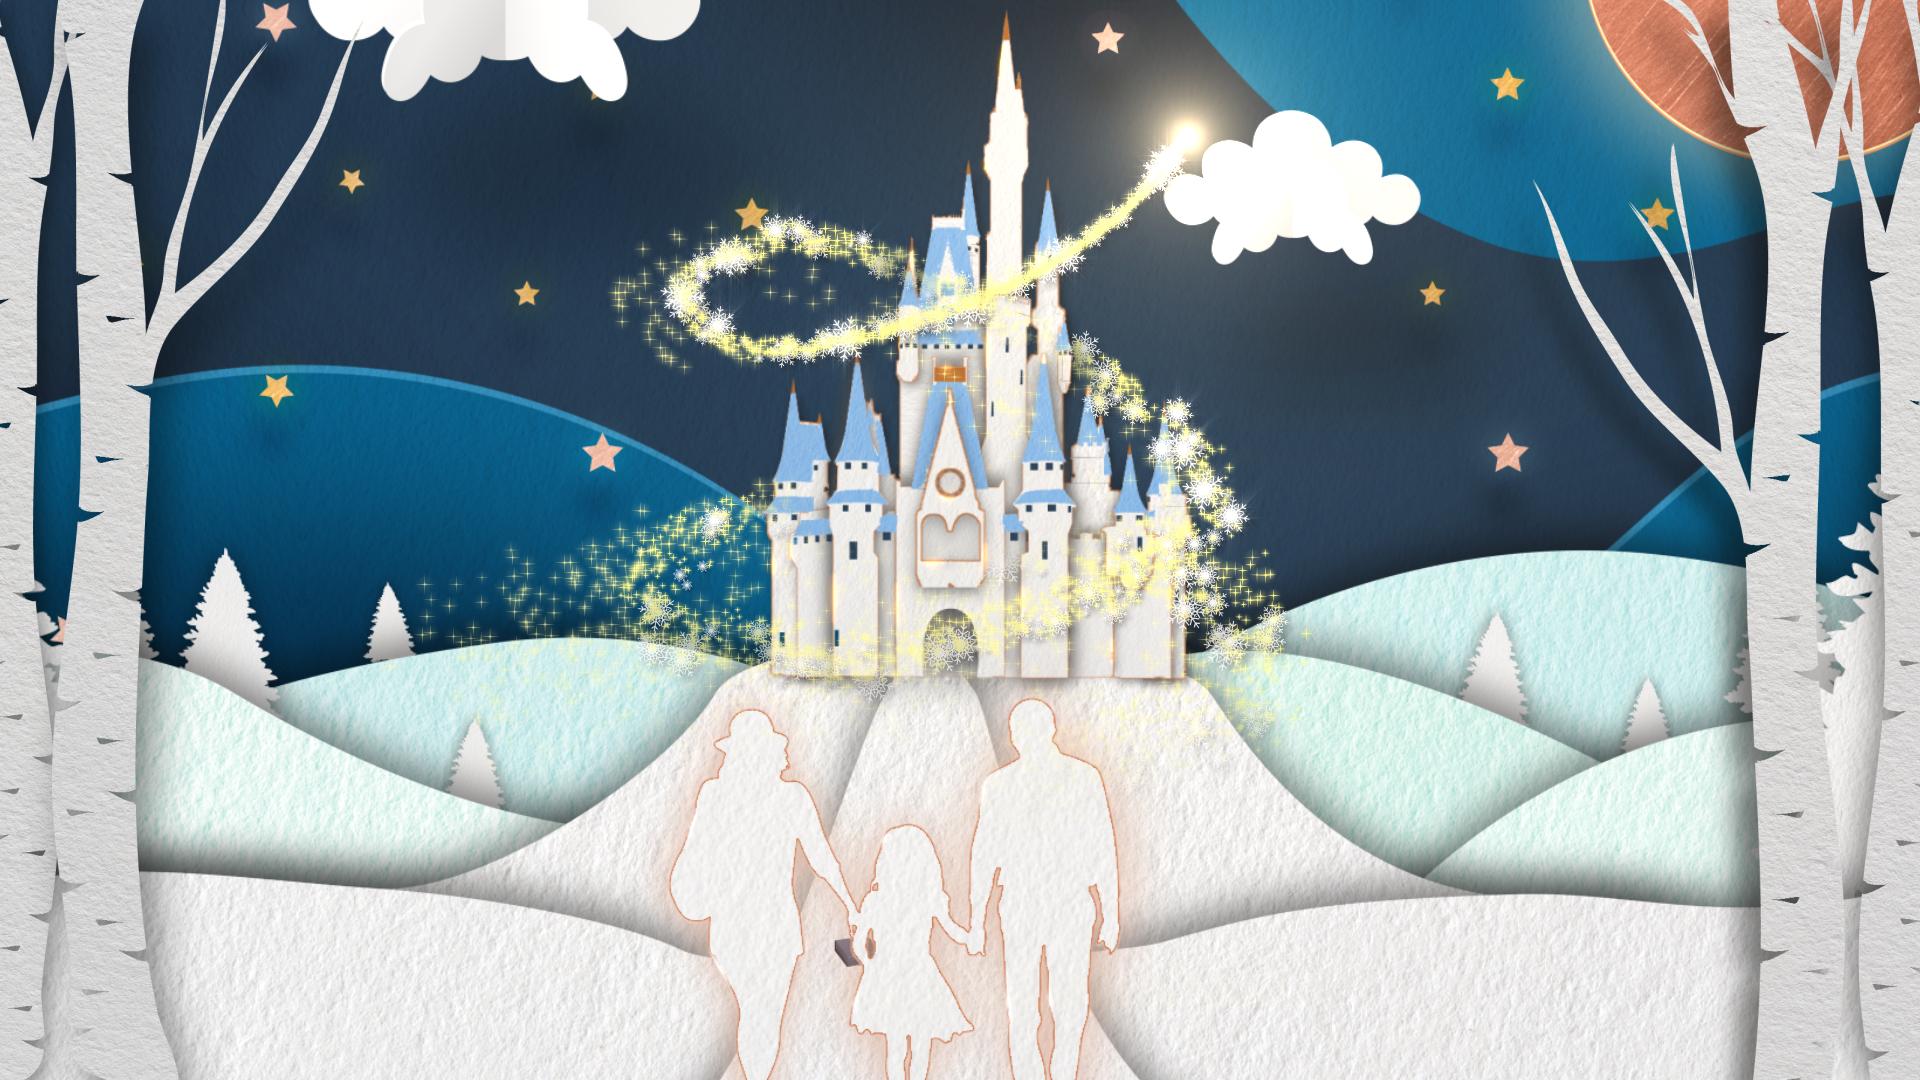 Disney Parks Magical Holiday Celebration